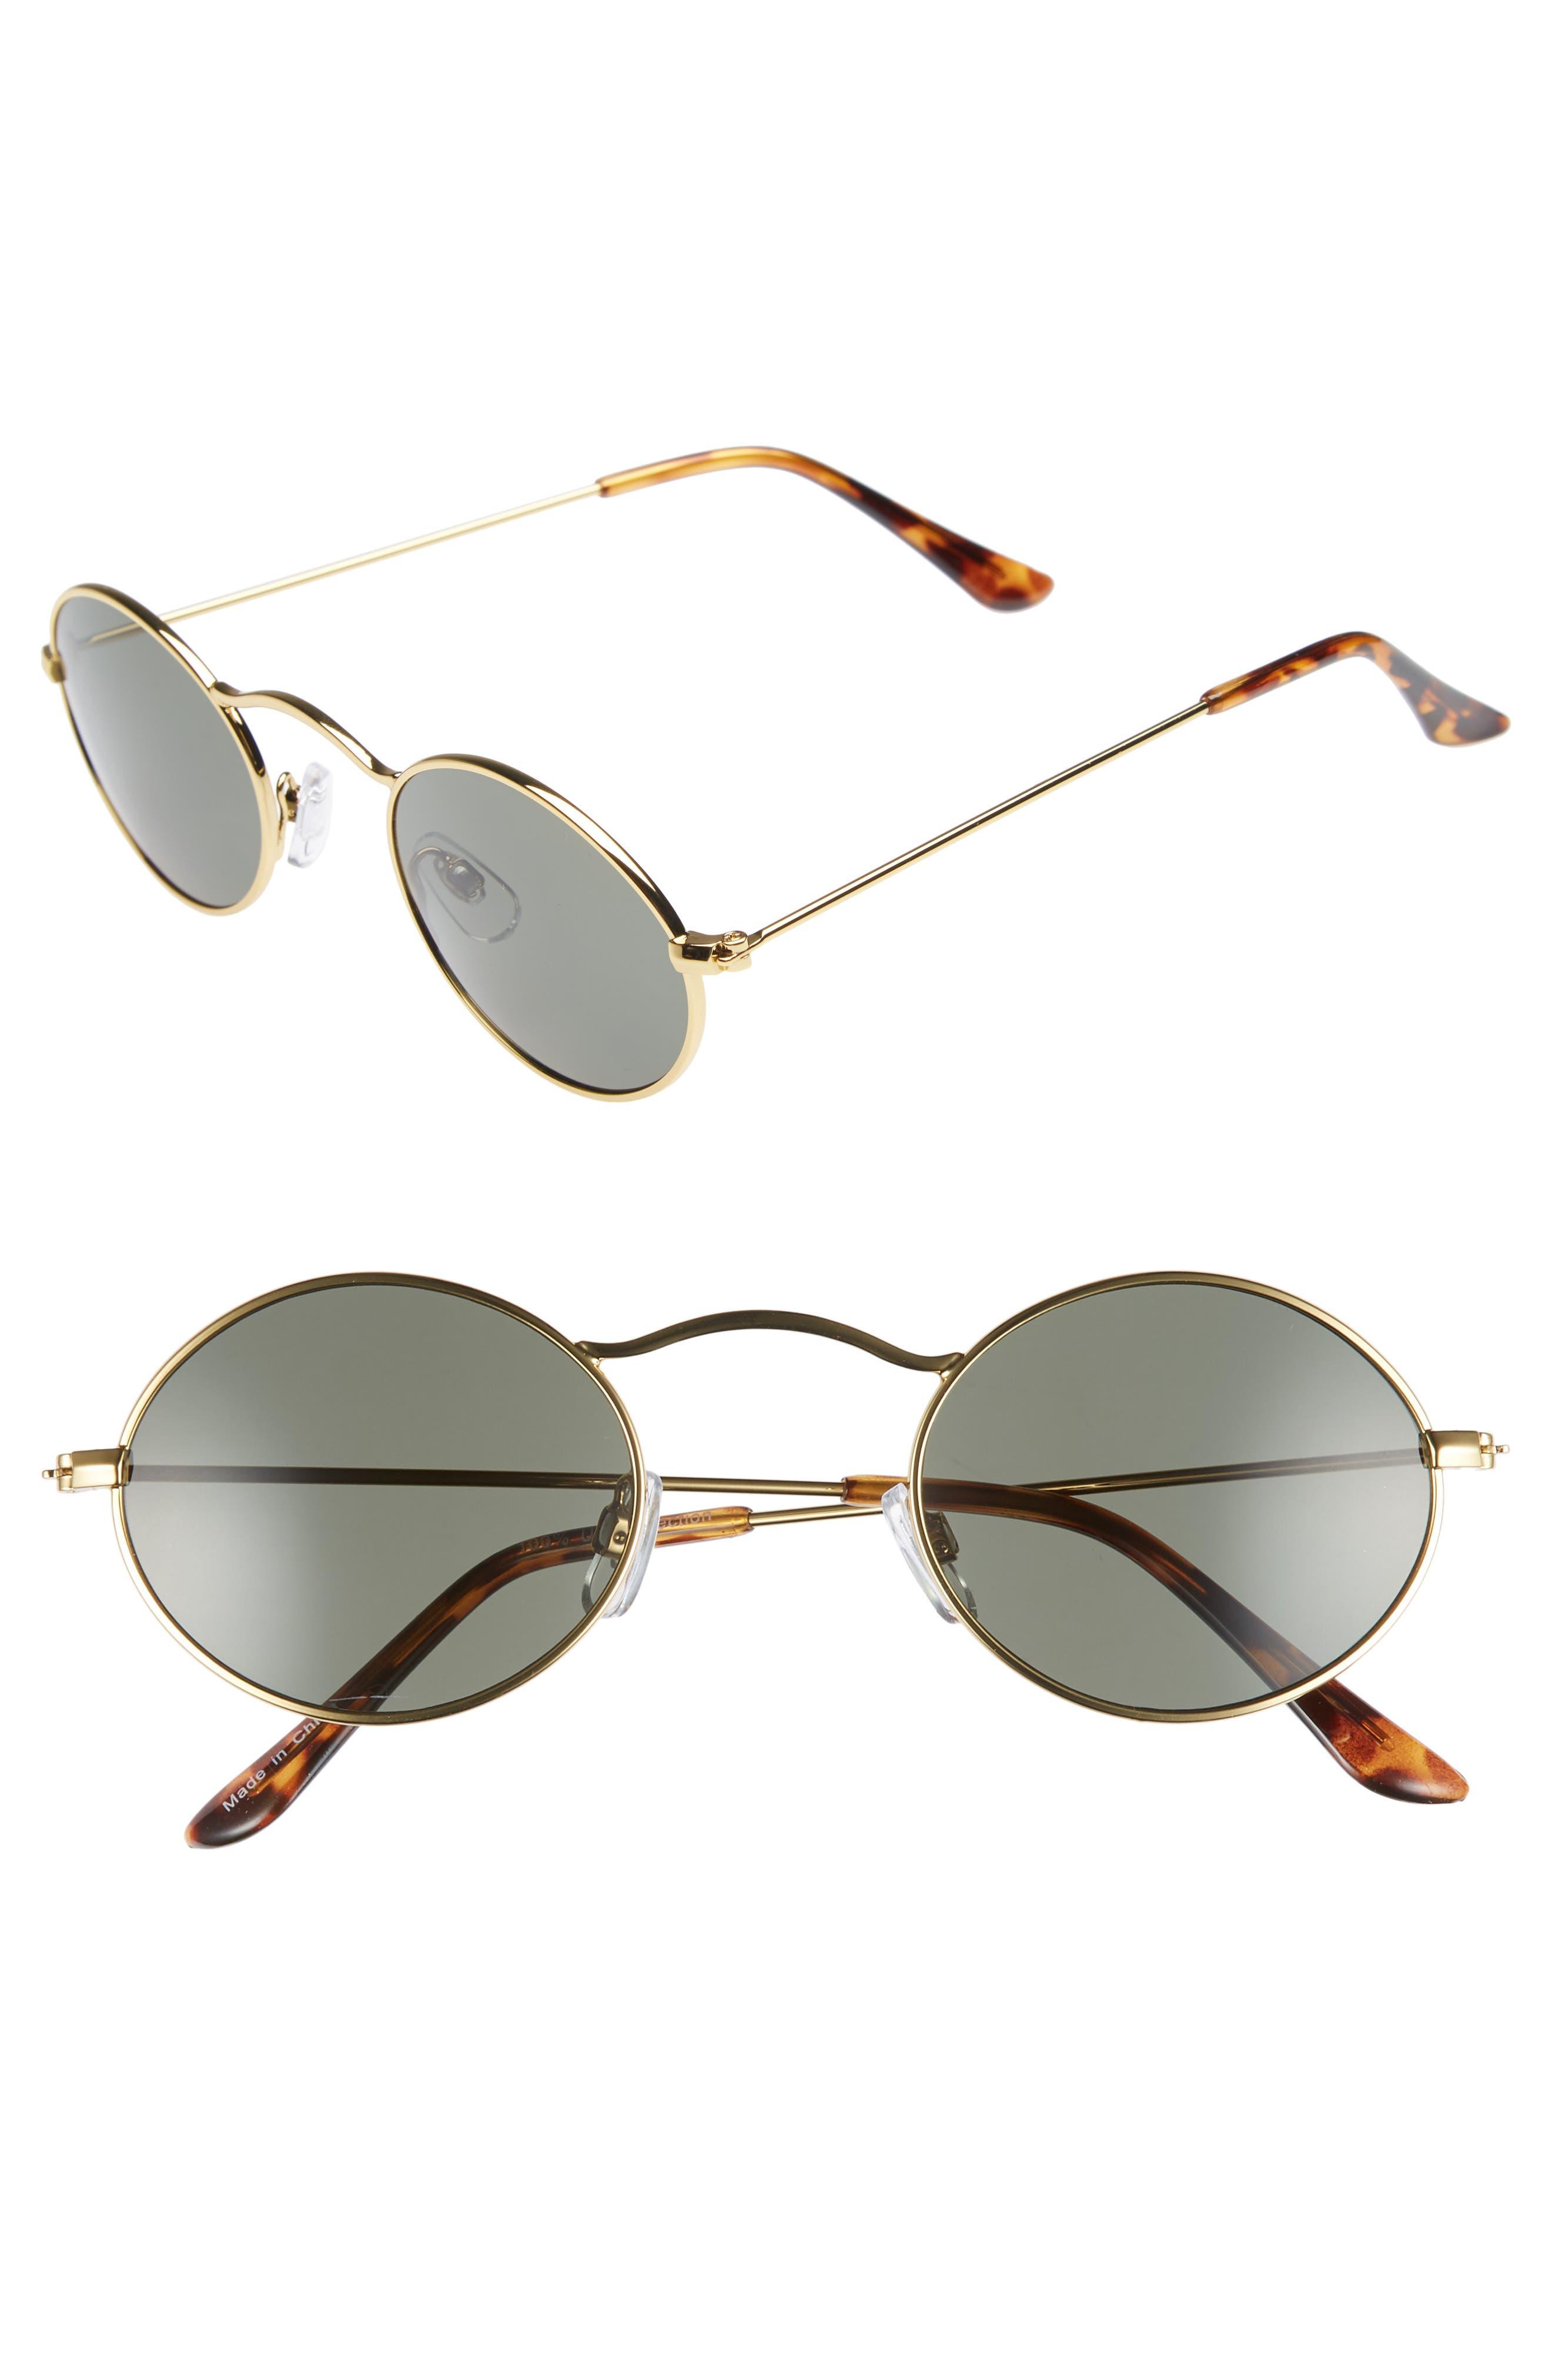 48mm Small Oval Sunglasses,                         Main,                         color, Gold/ Black